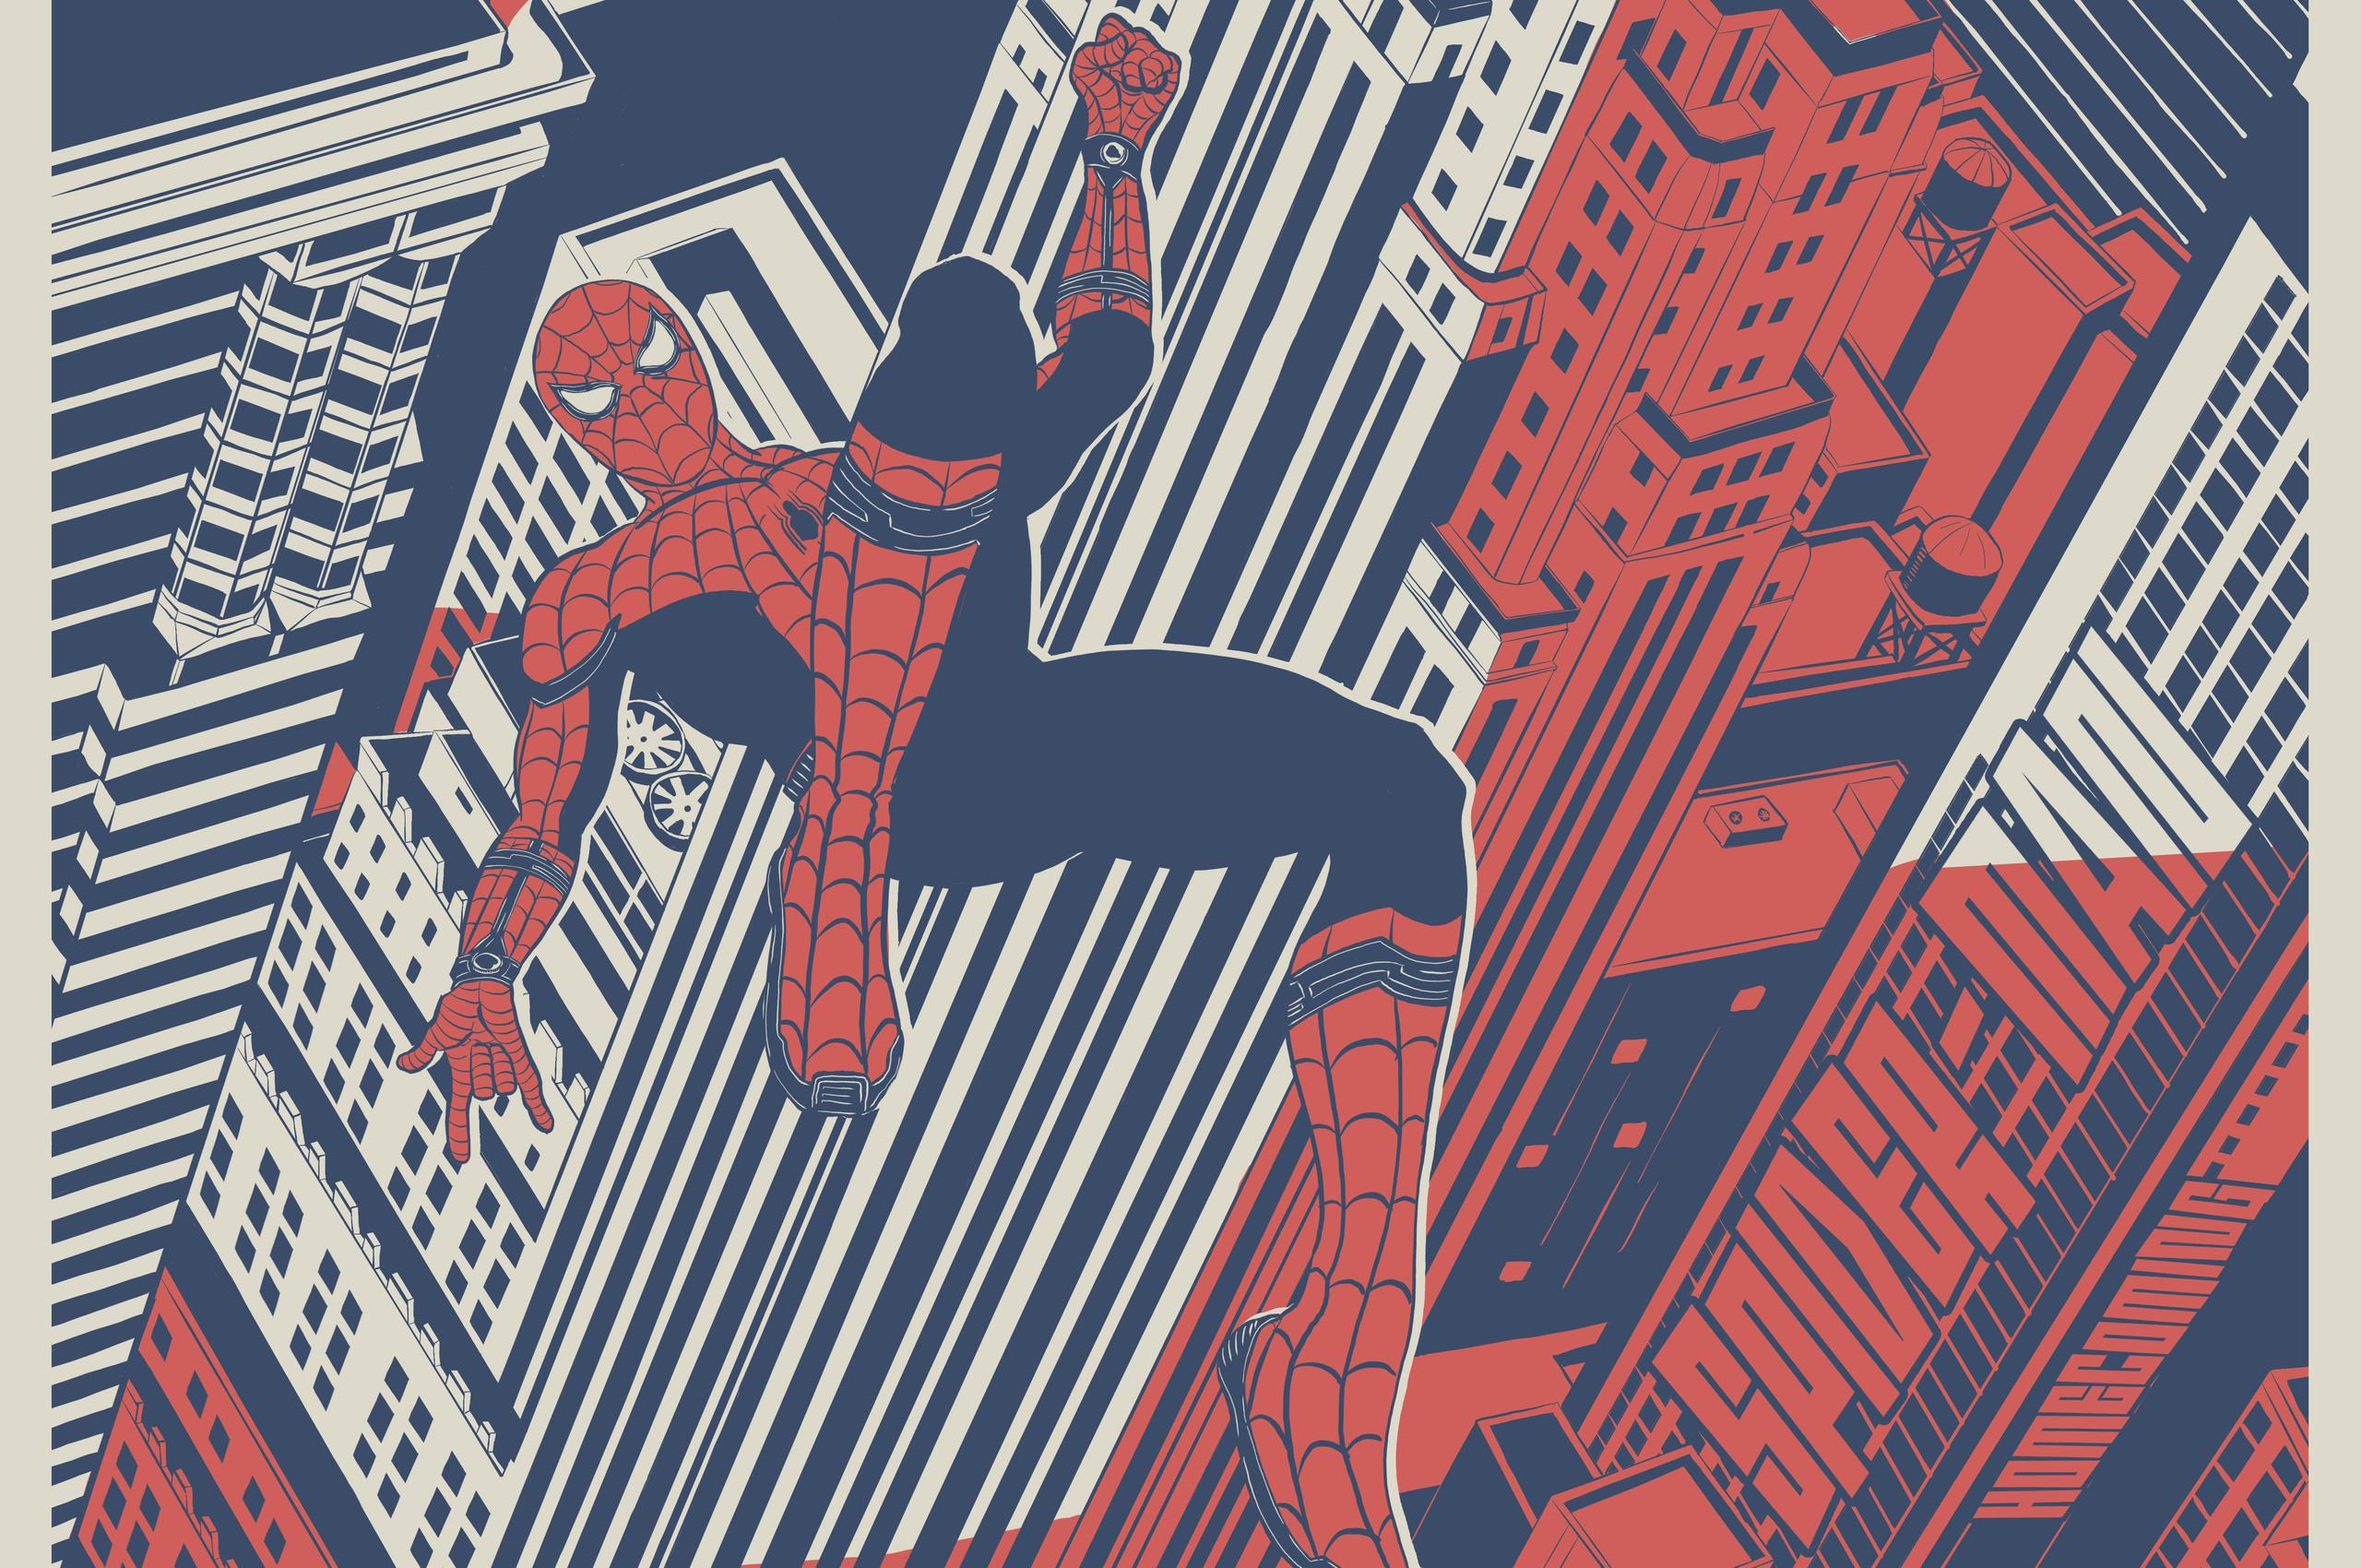 spiderman-homecoming-artwork-hq.jpg